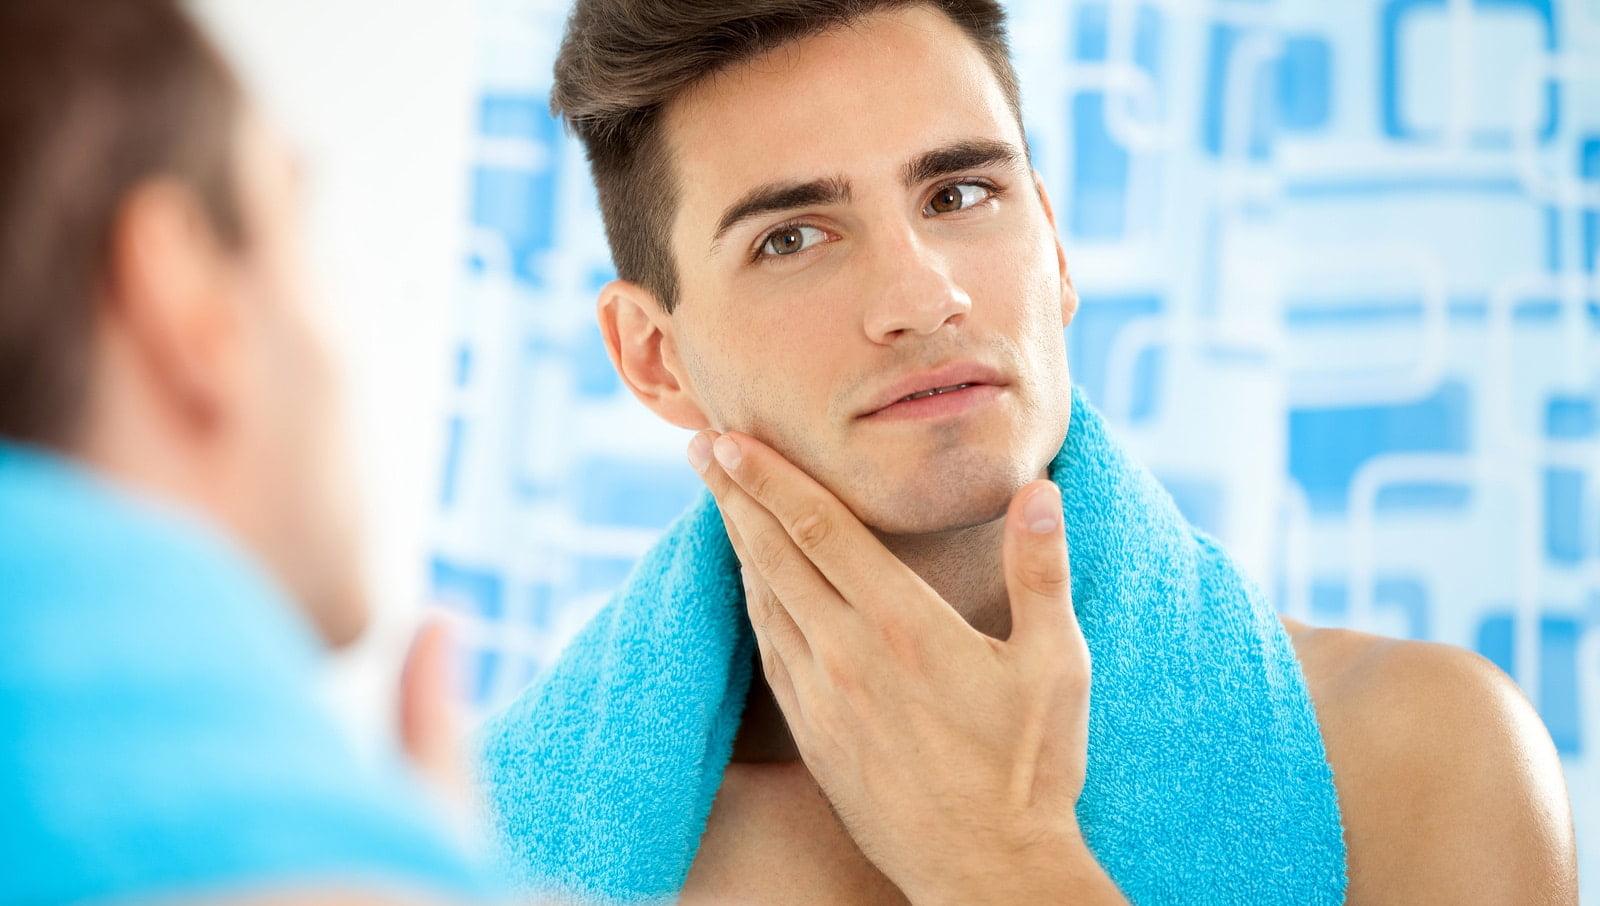 4 como conseguir barbear perfeito homens que se cuidam.jpg